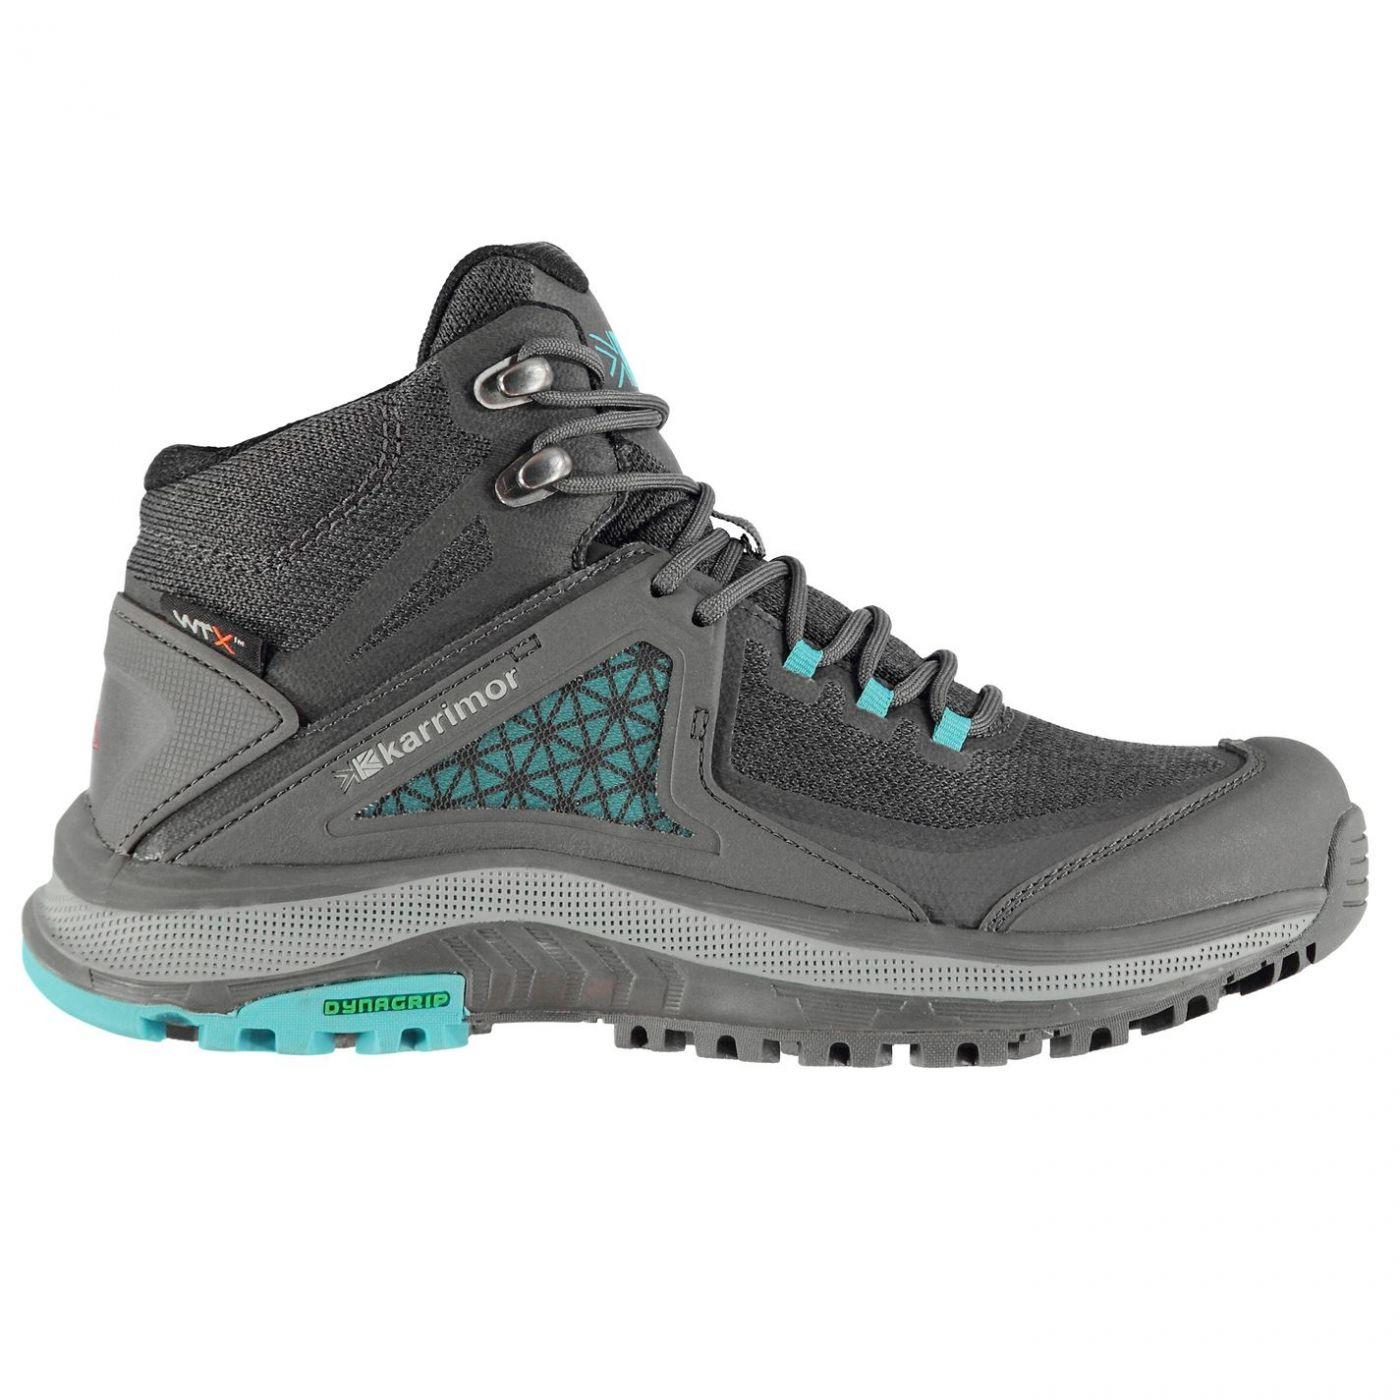 Karrimor Stanedge Ladies Walking Boots